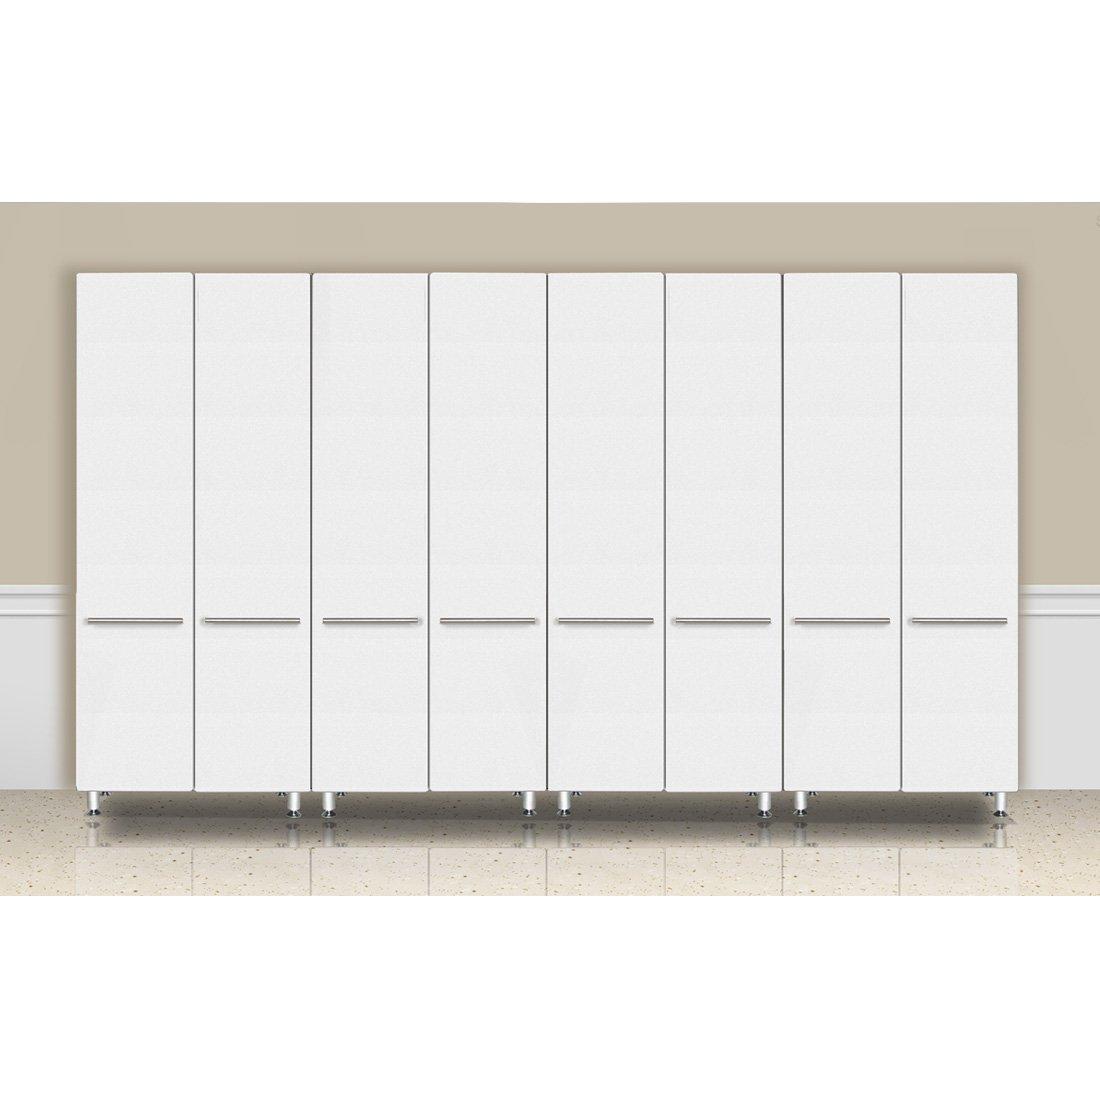 Ulti-MATE Storage GA-064KSW 4-Piece Tall Garage Cabinet Kit in Starfire Pearl